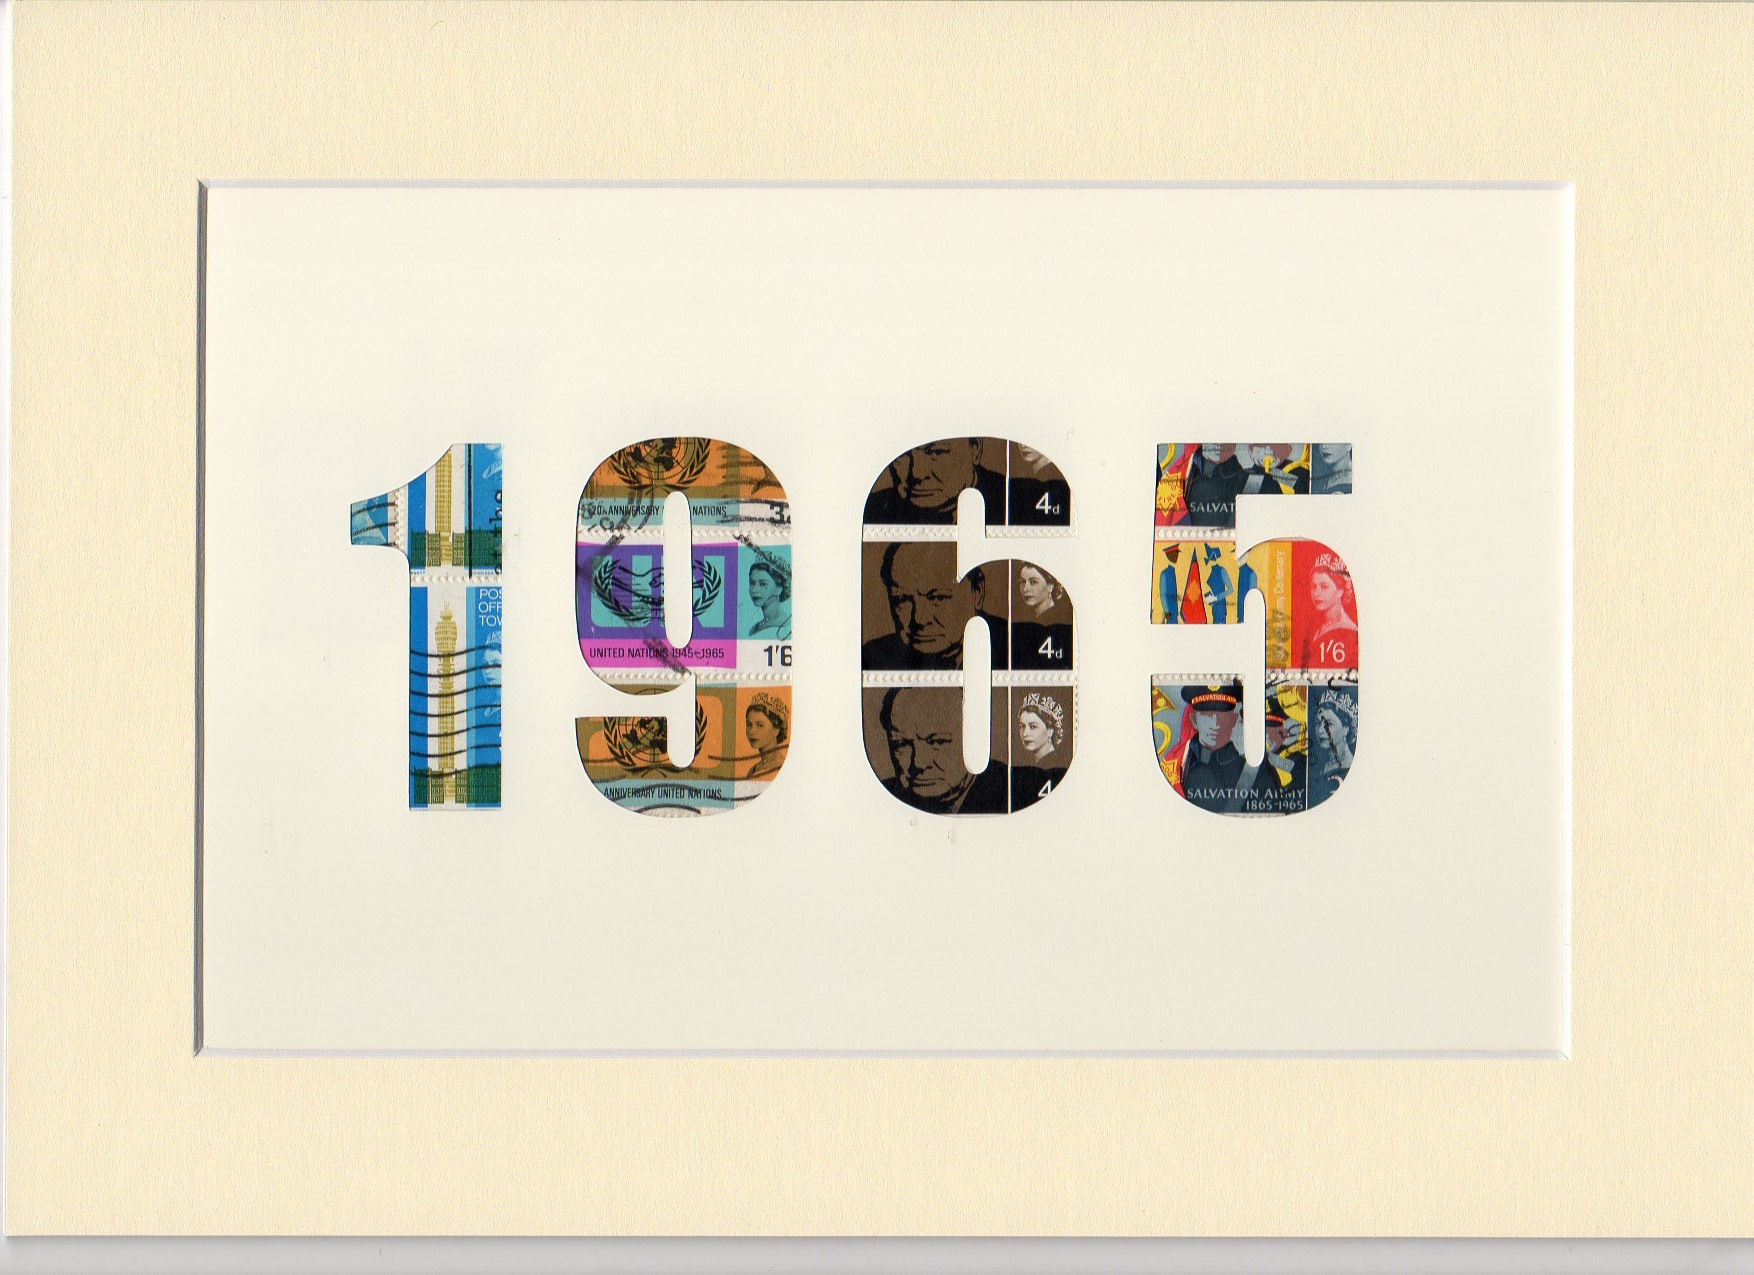 1965 50th birthday